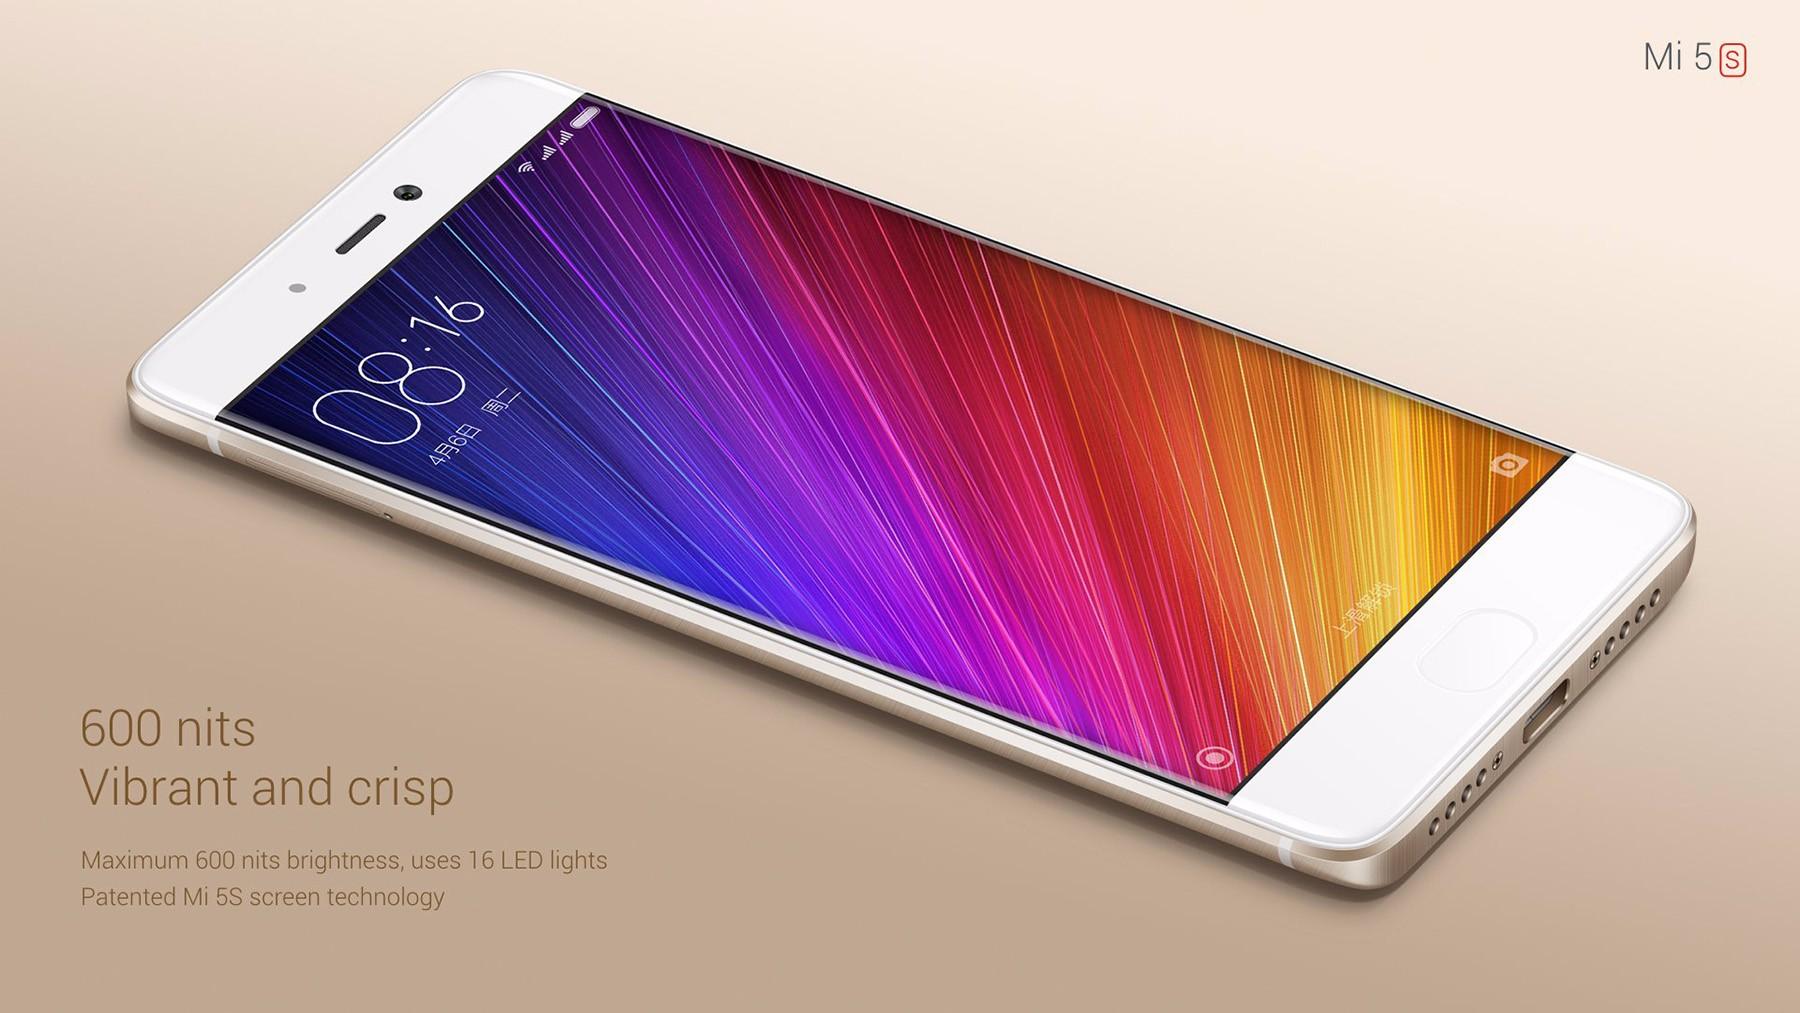 Android Oreo per Mi 5S!